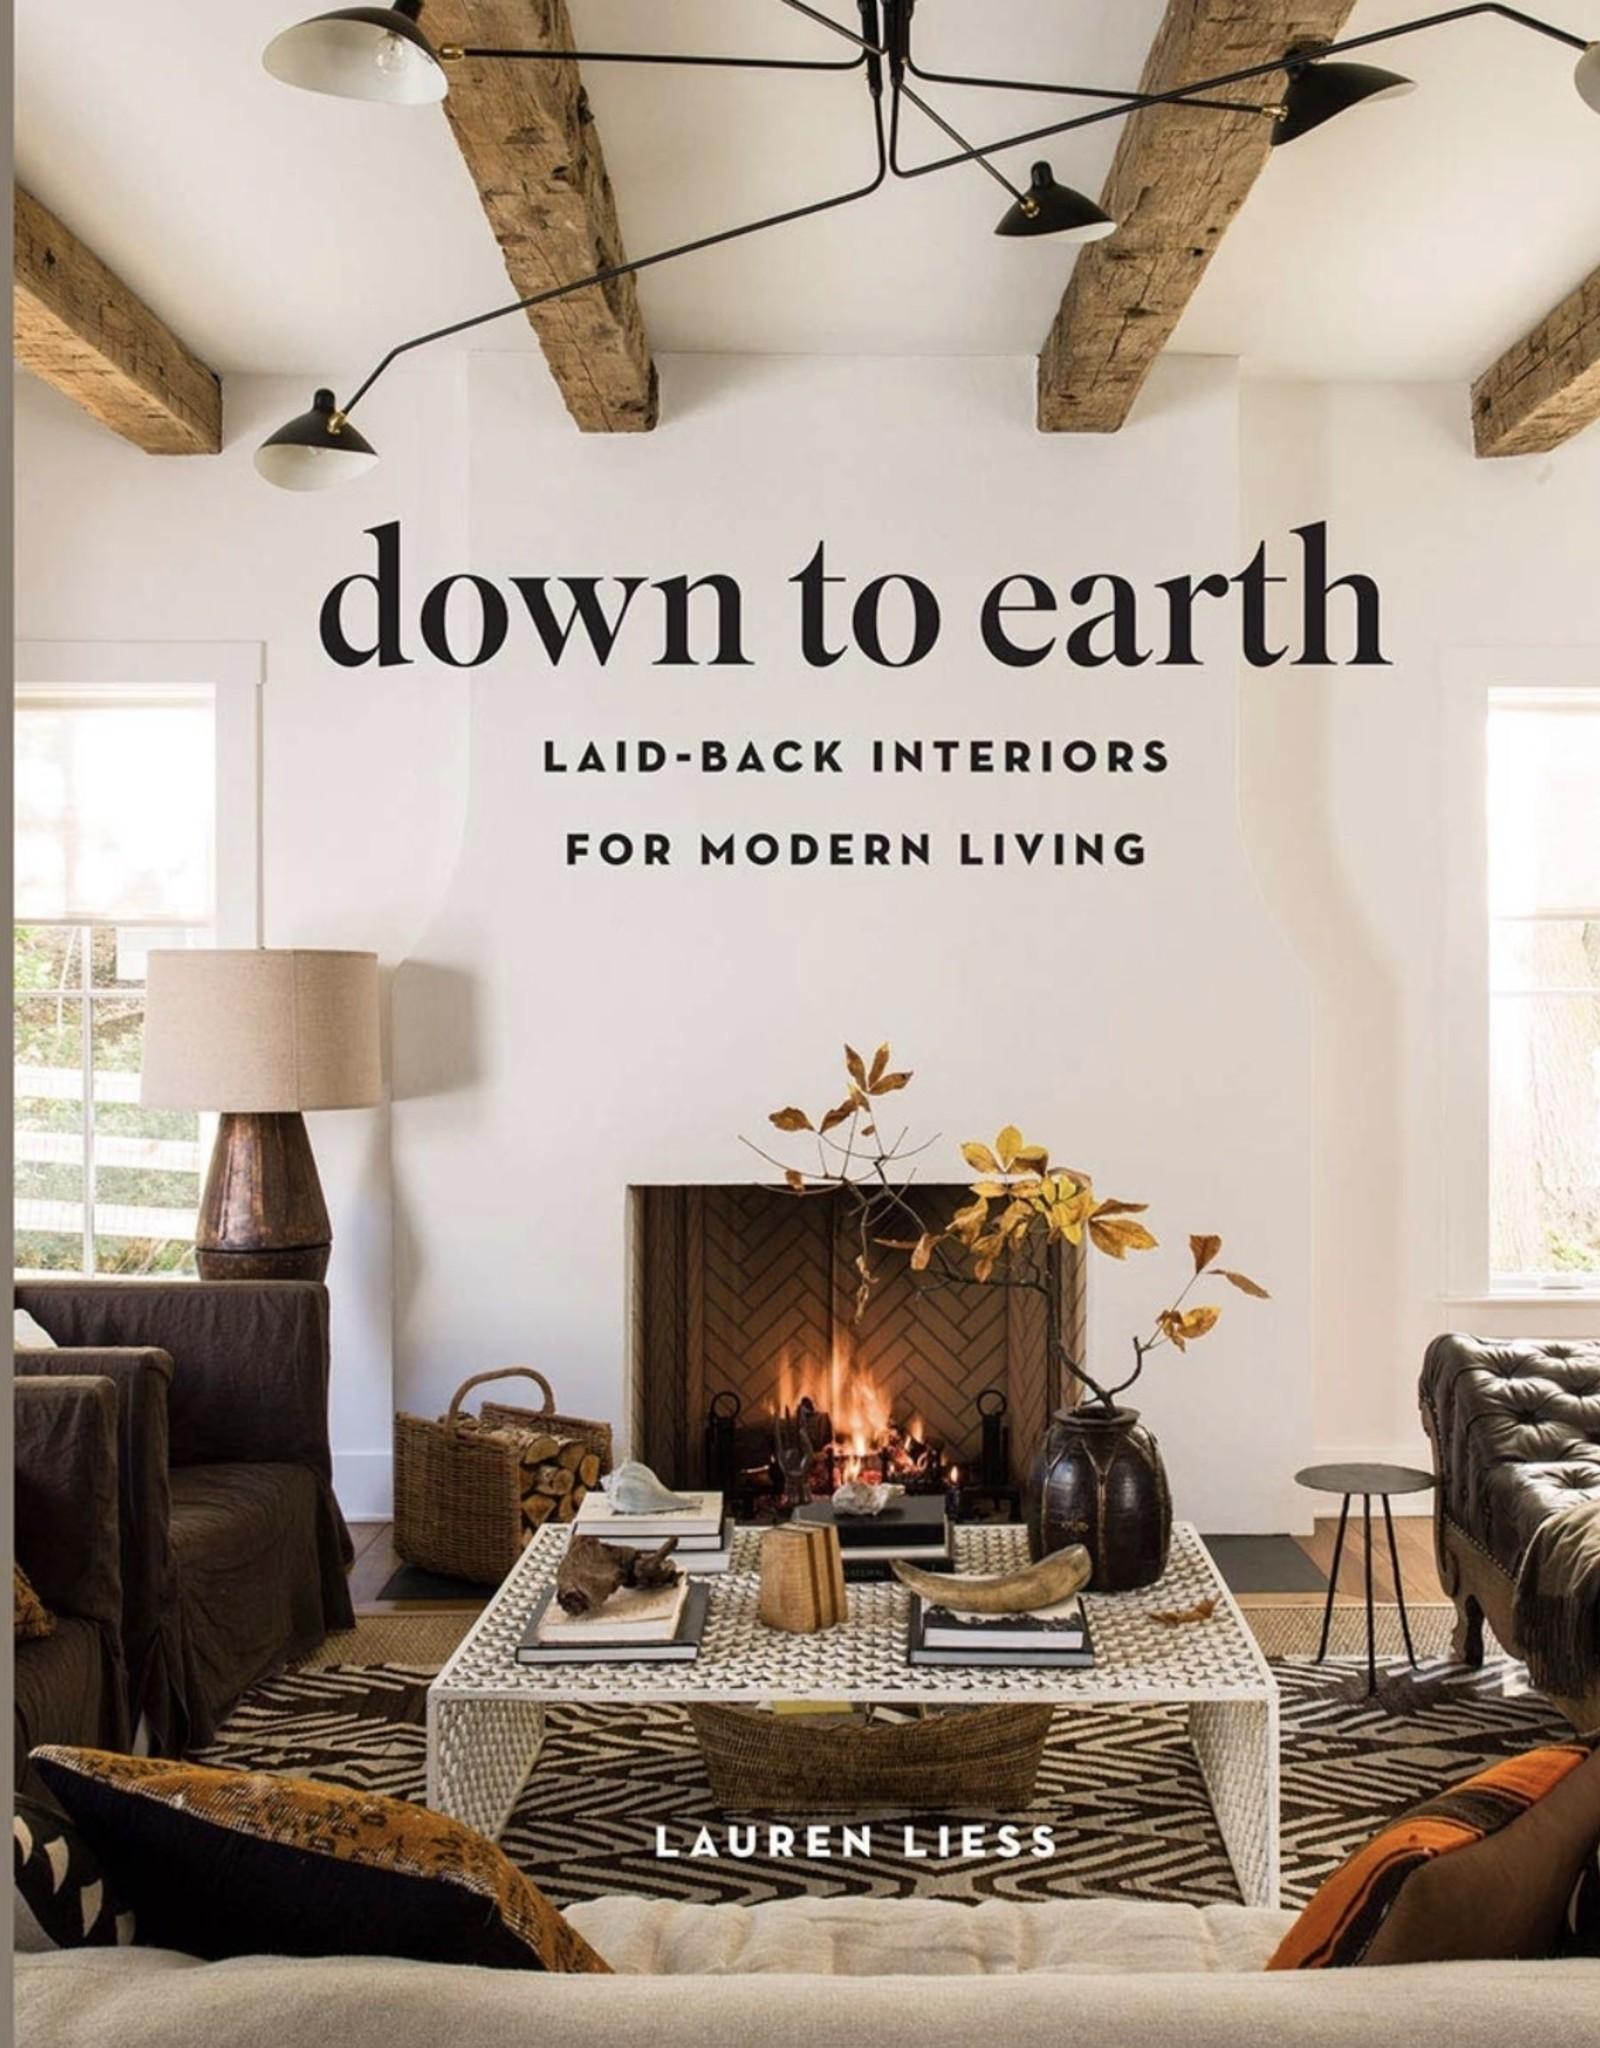 Down to earth, Lauren Liess